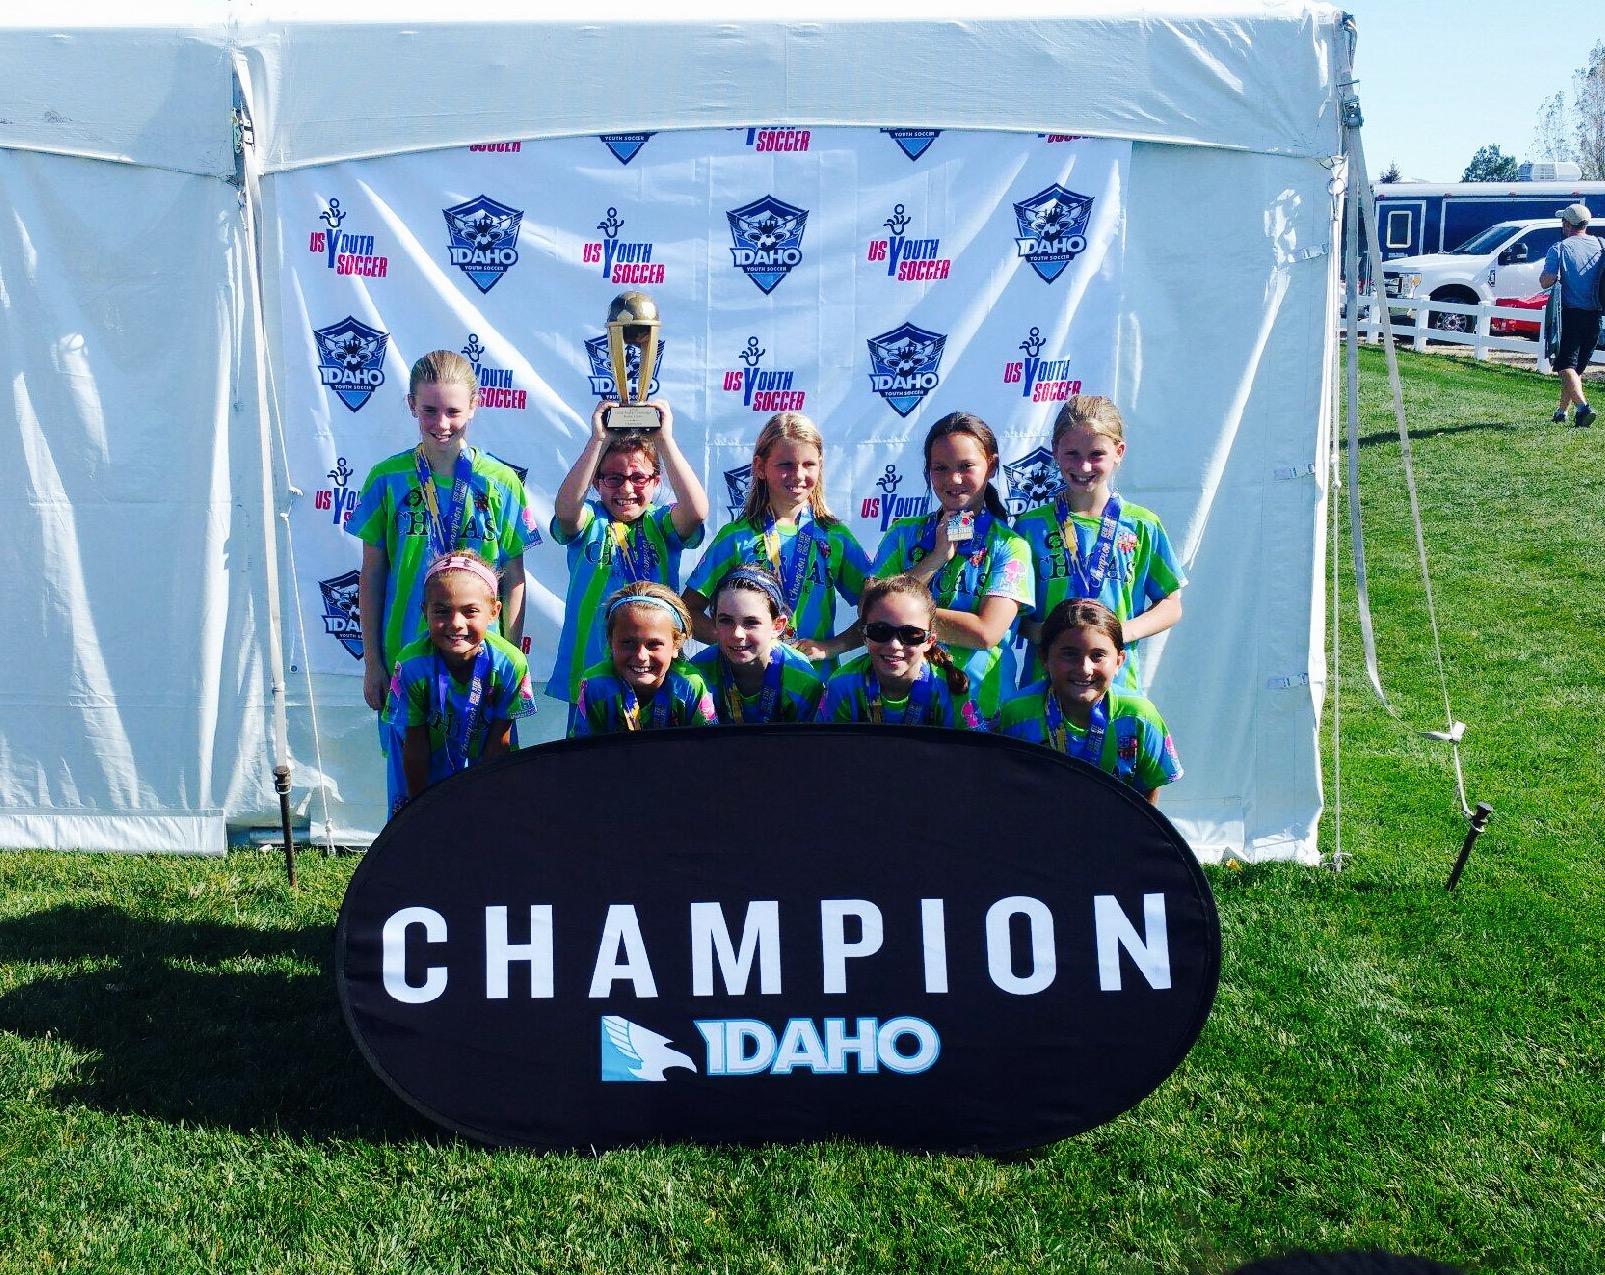 U11 Chicas Lime - Champions